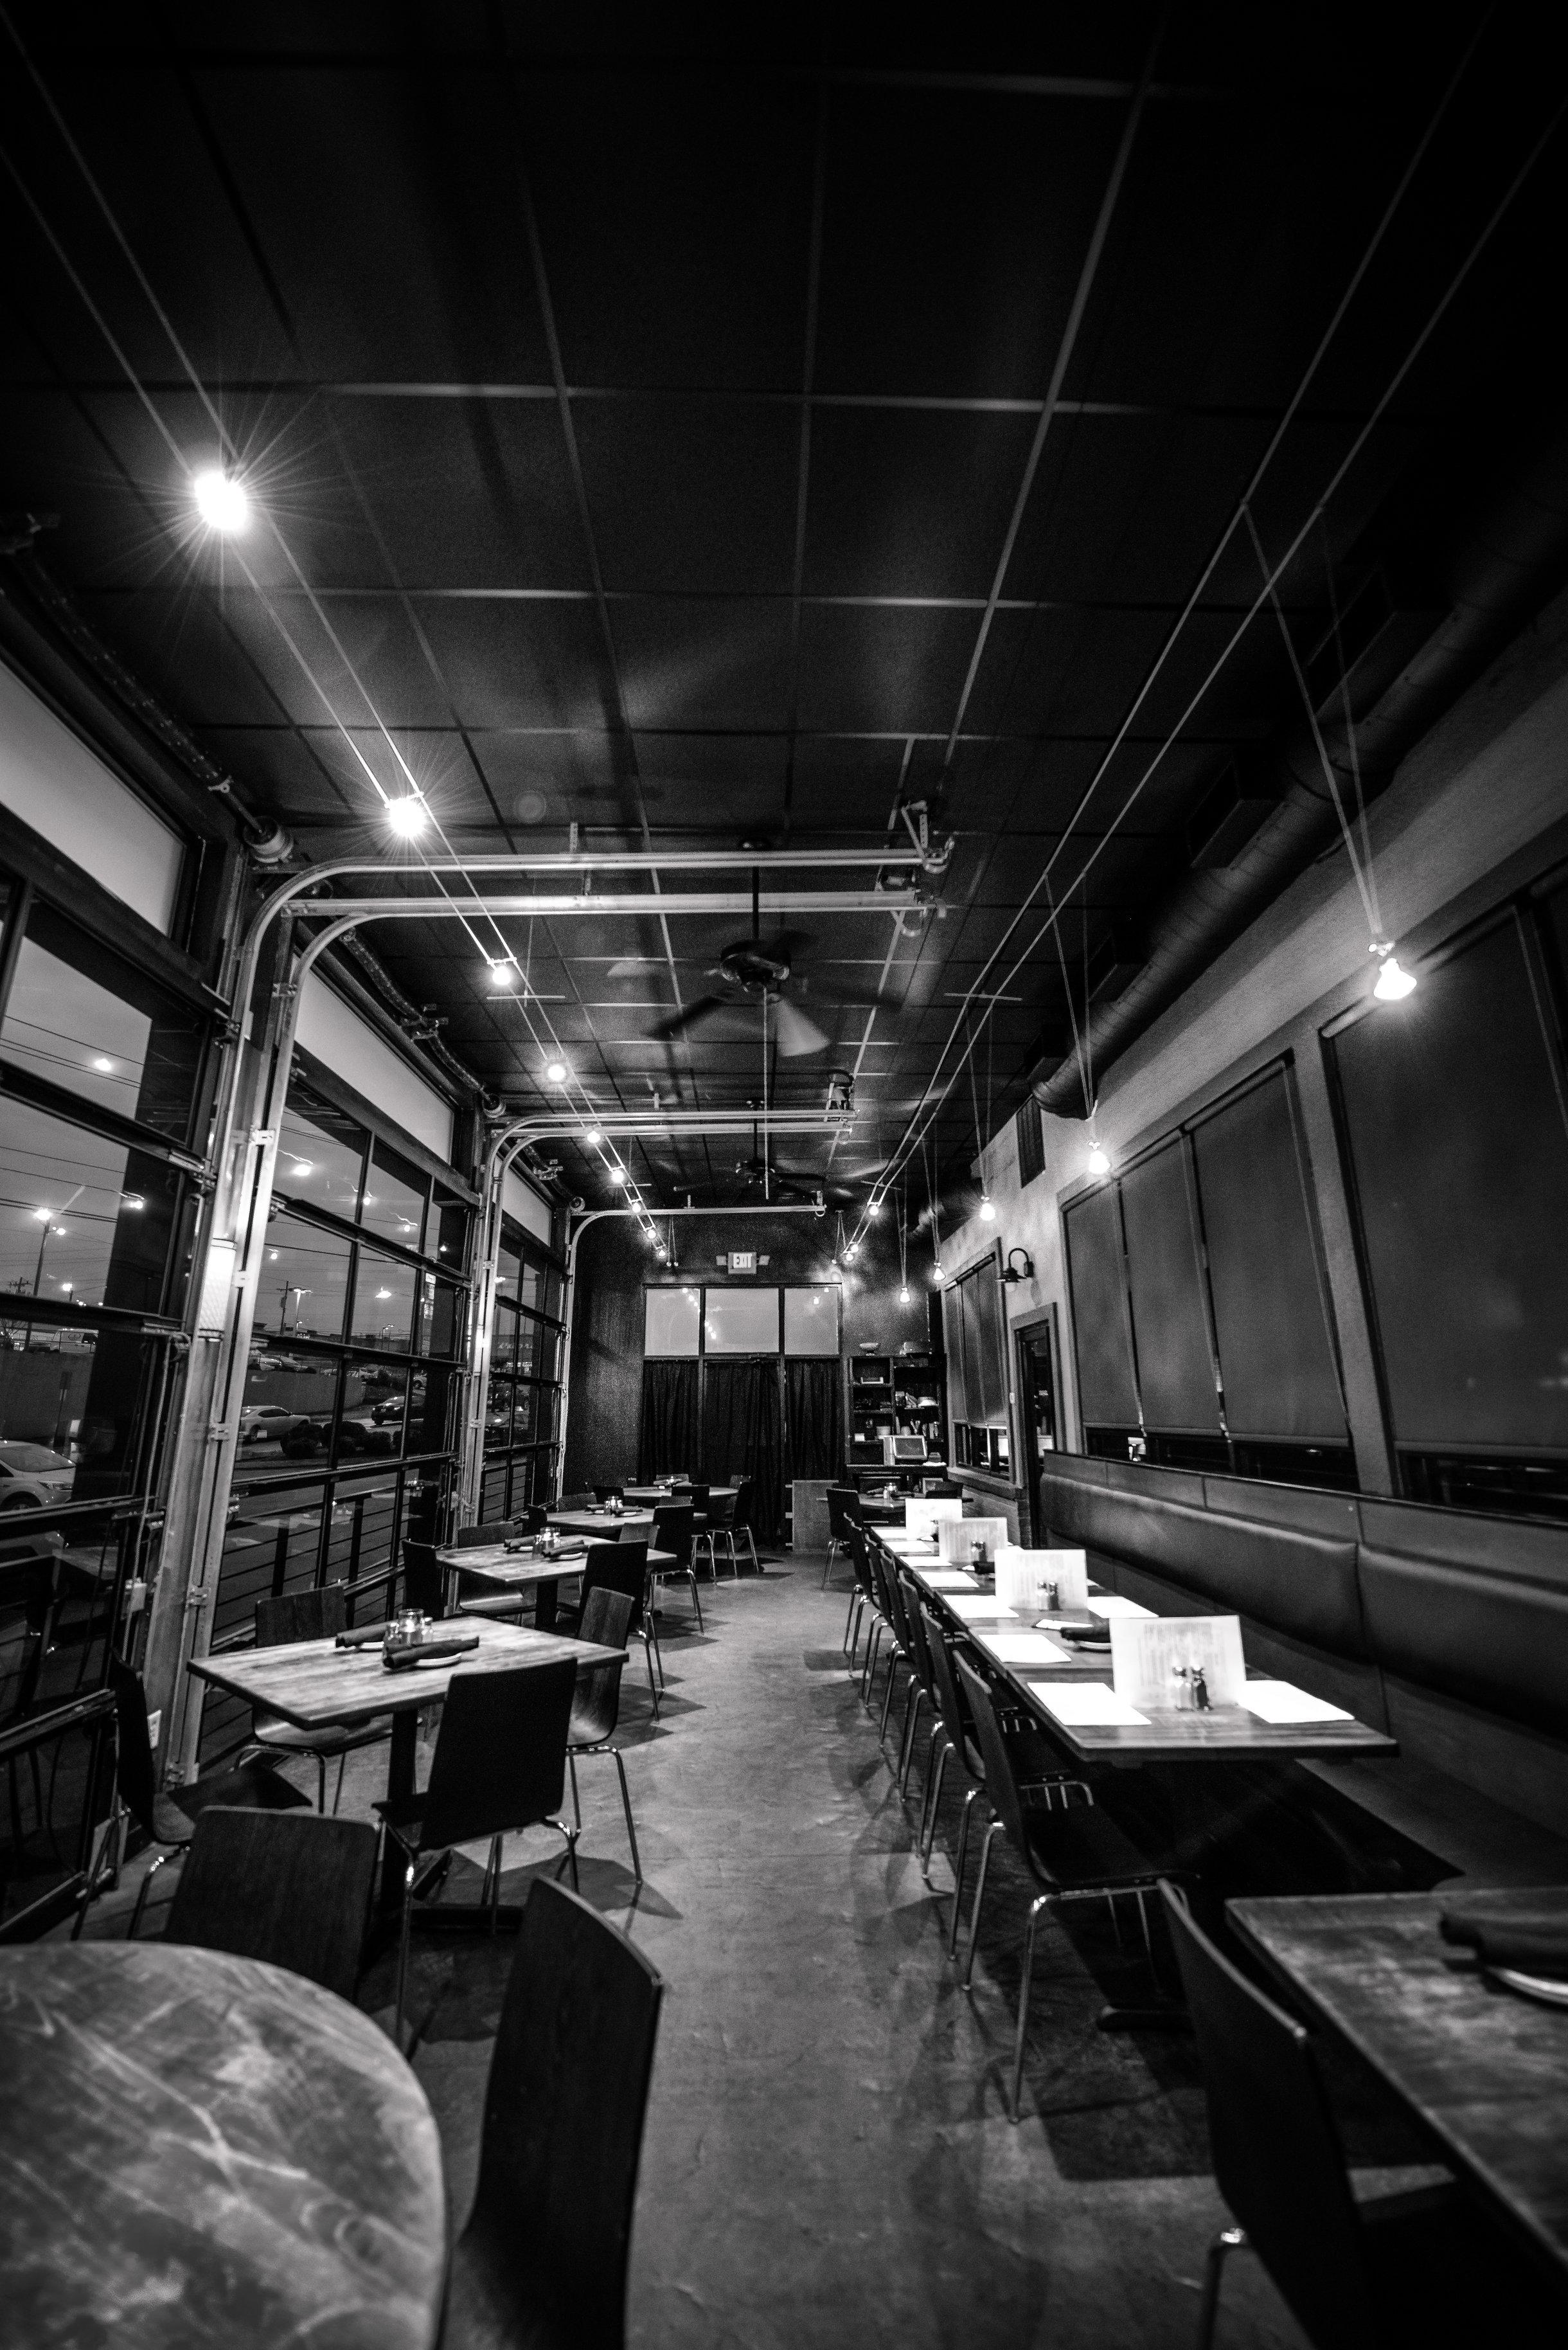 darfons-restaurant-garage-room-2r